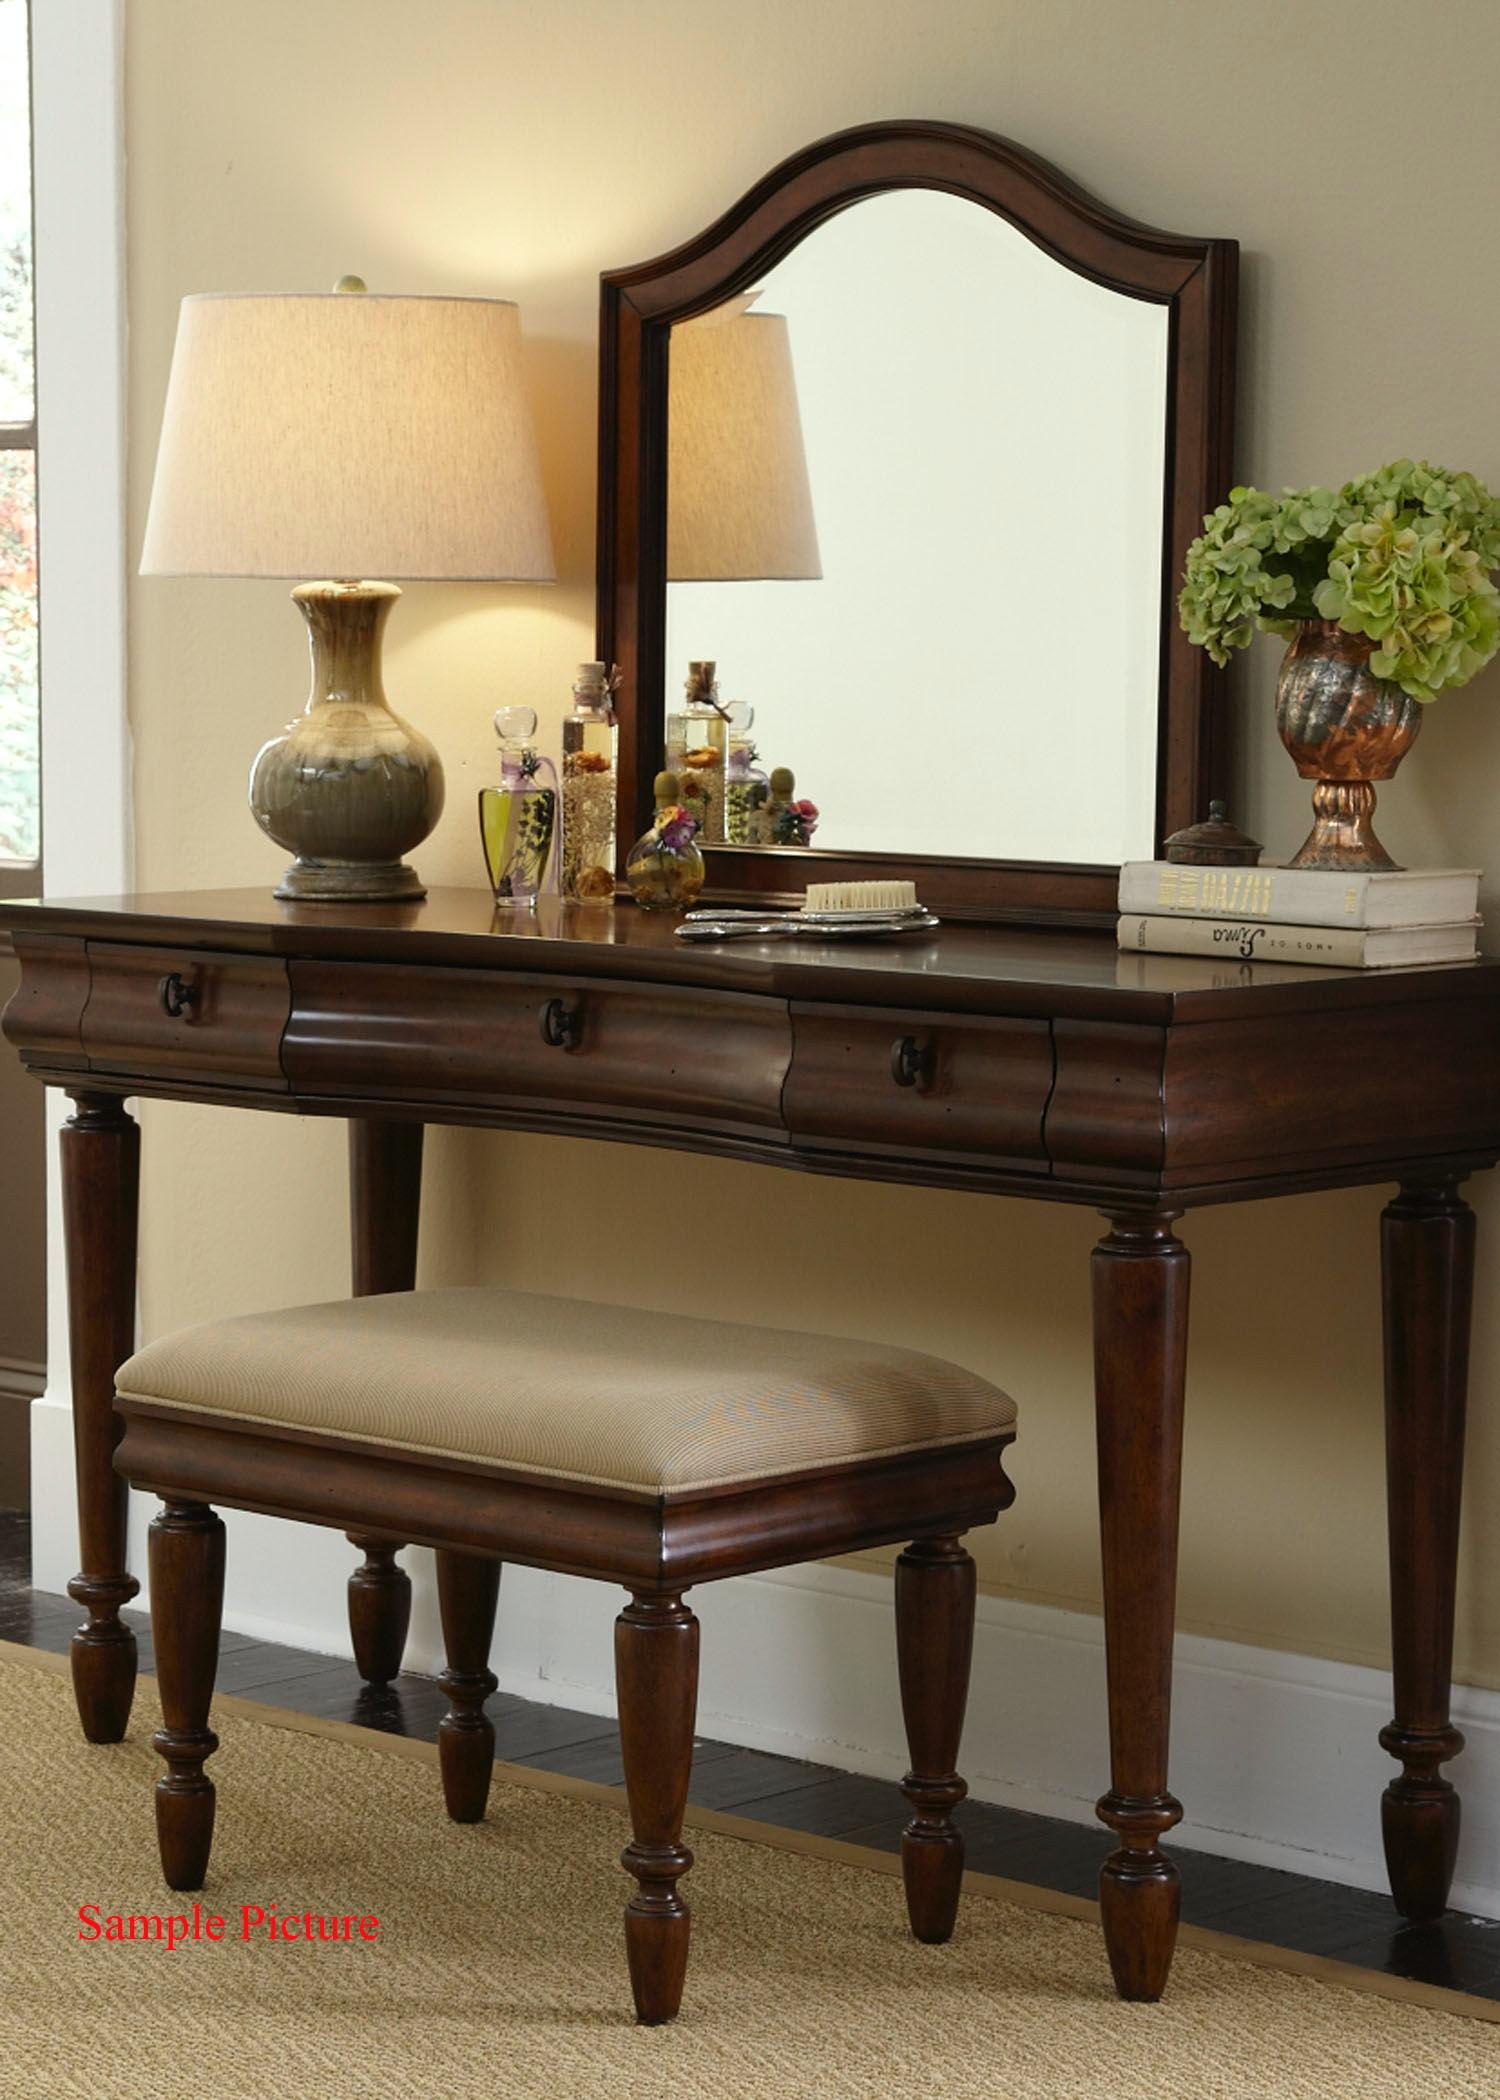 Amazing Liberty Furniture Vanity 589 BR35 At Gustafsonu0027s Furniture And Mattress